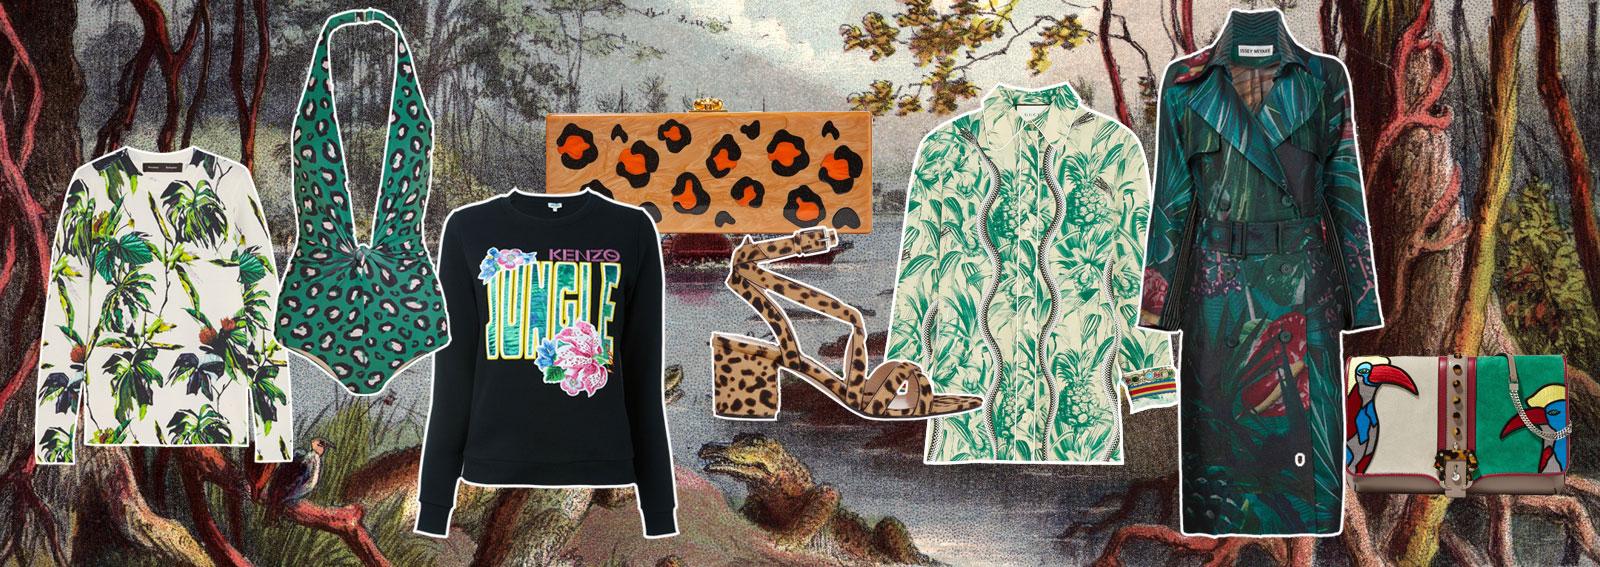 cover into the jungle la tendenza tropical dekstop